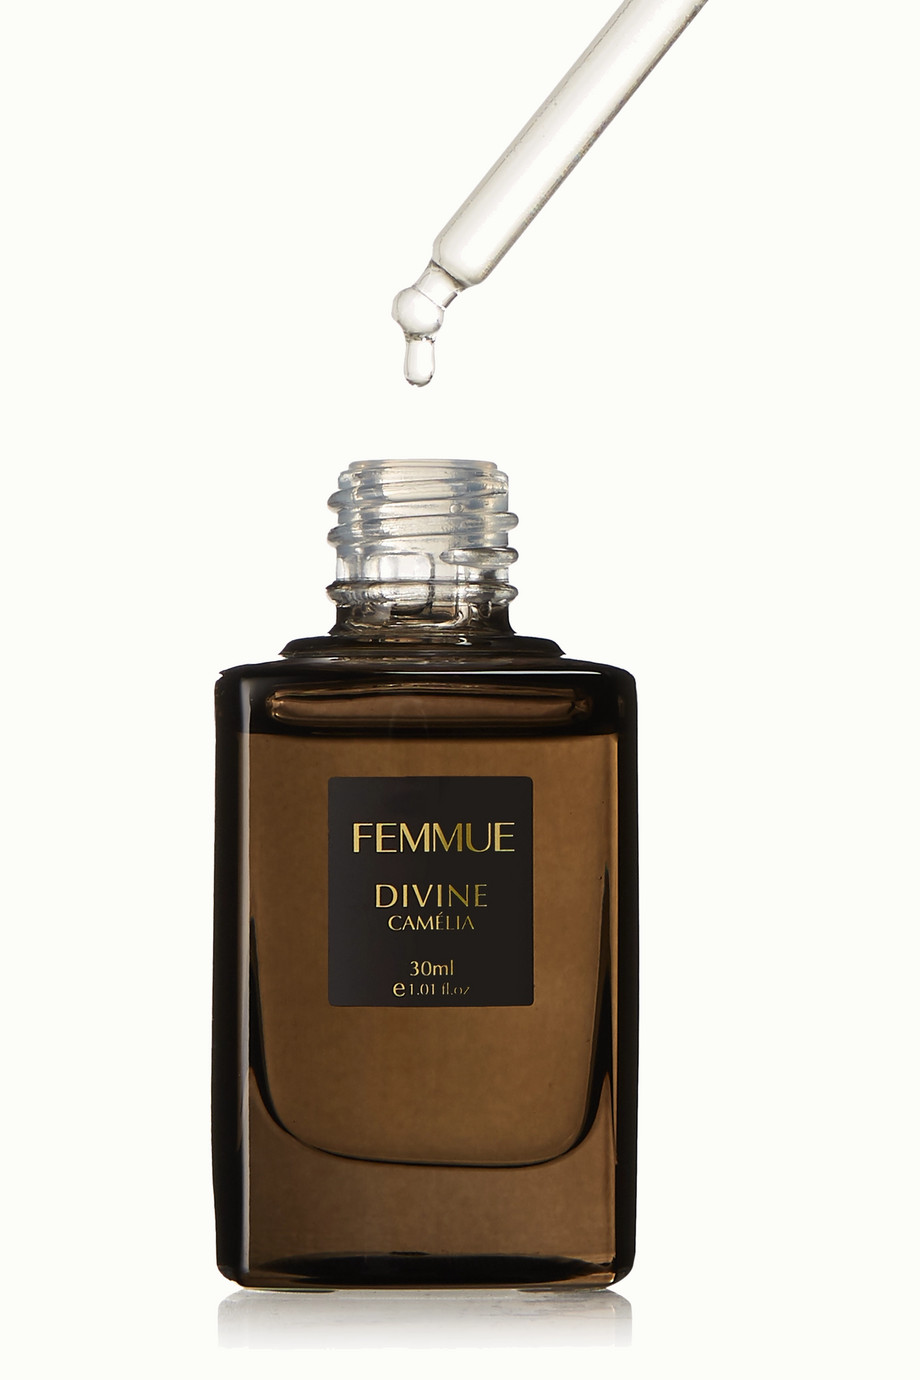 FEMMUE Divine Camélia Face Oil, 30ml